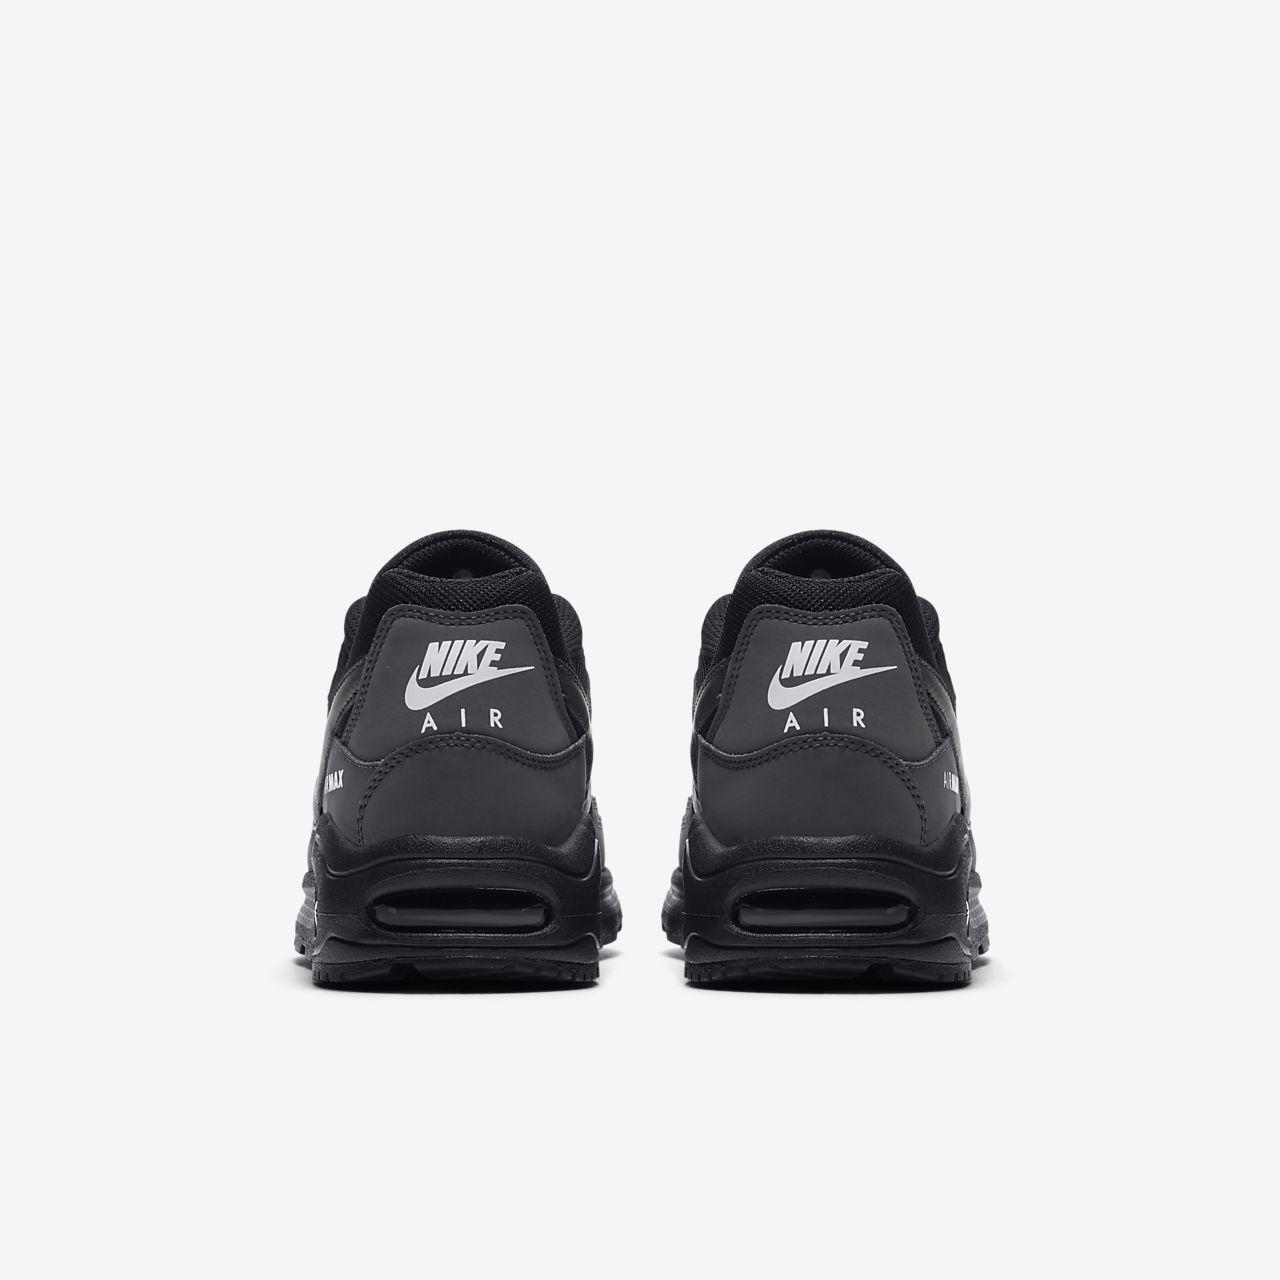 Nike Air Max Command Flex Junior Noir 844346 002 Achat et